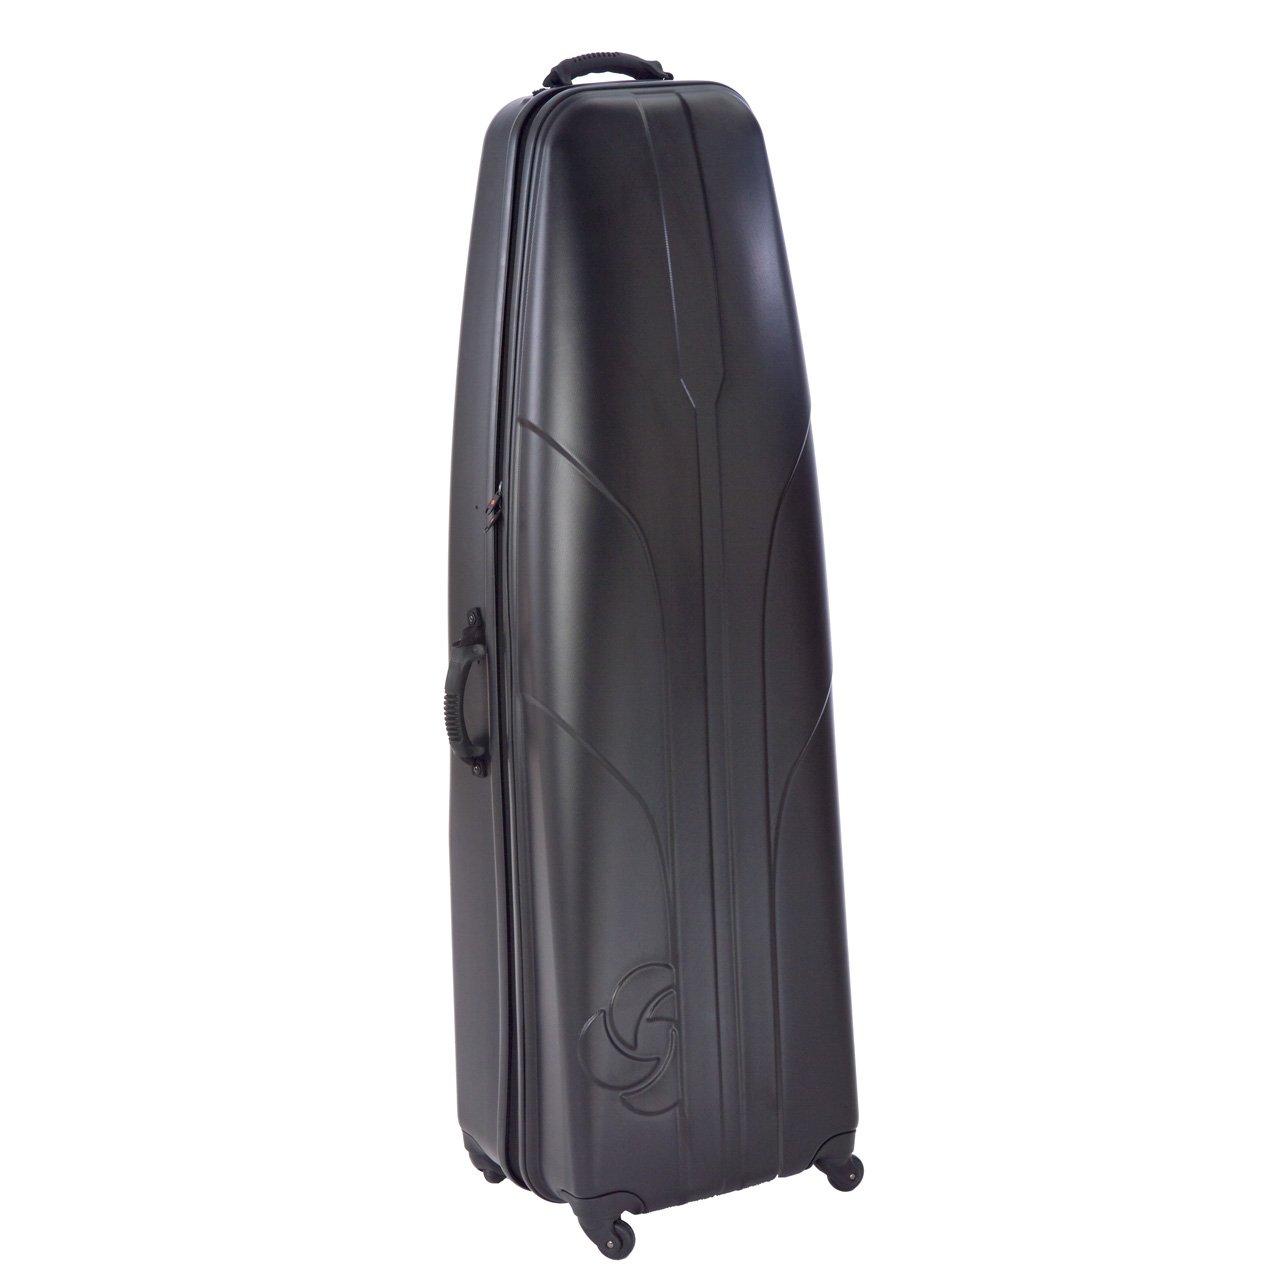 Samsonite Golf Hard-Sided Travel Cover Case, Black by Samsonite